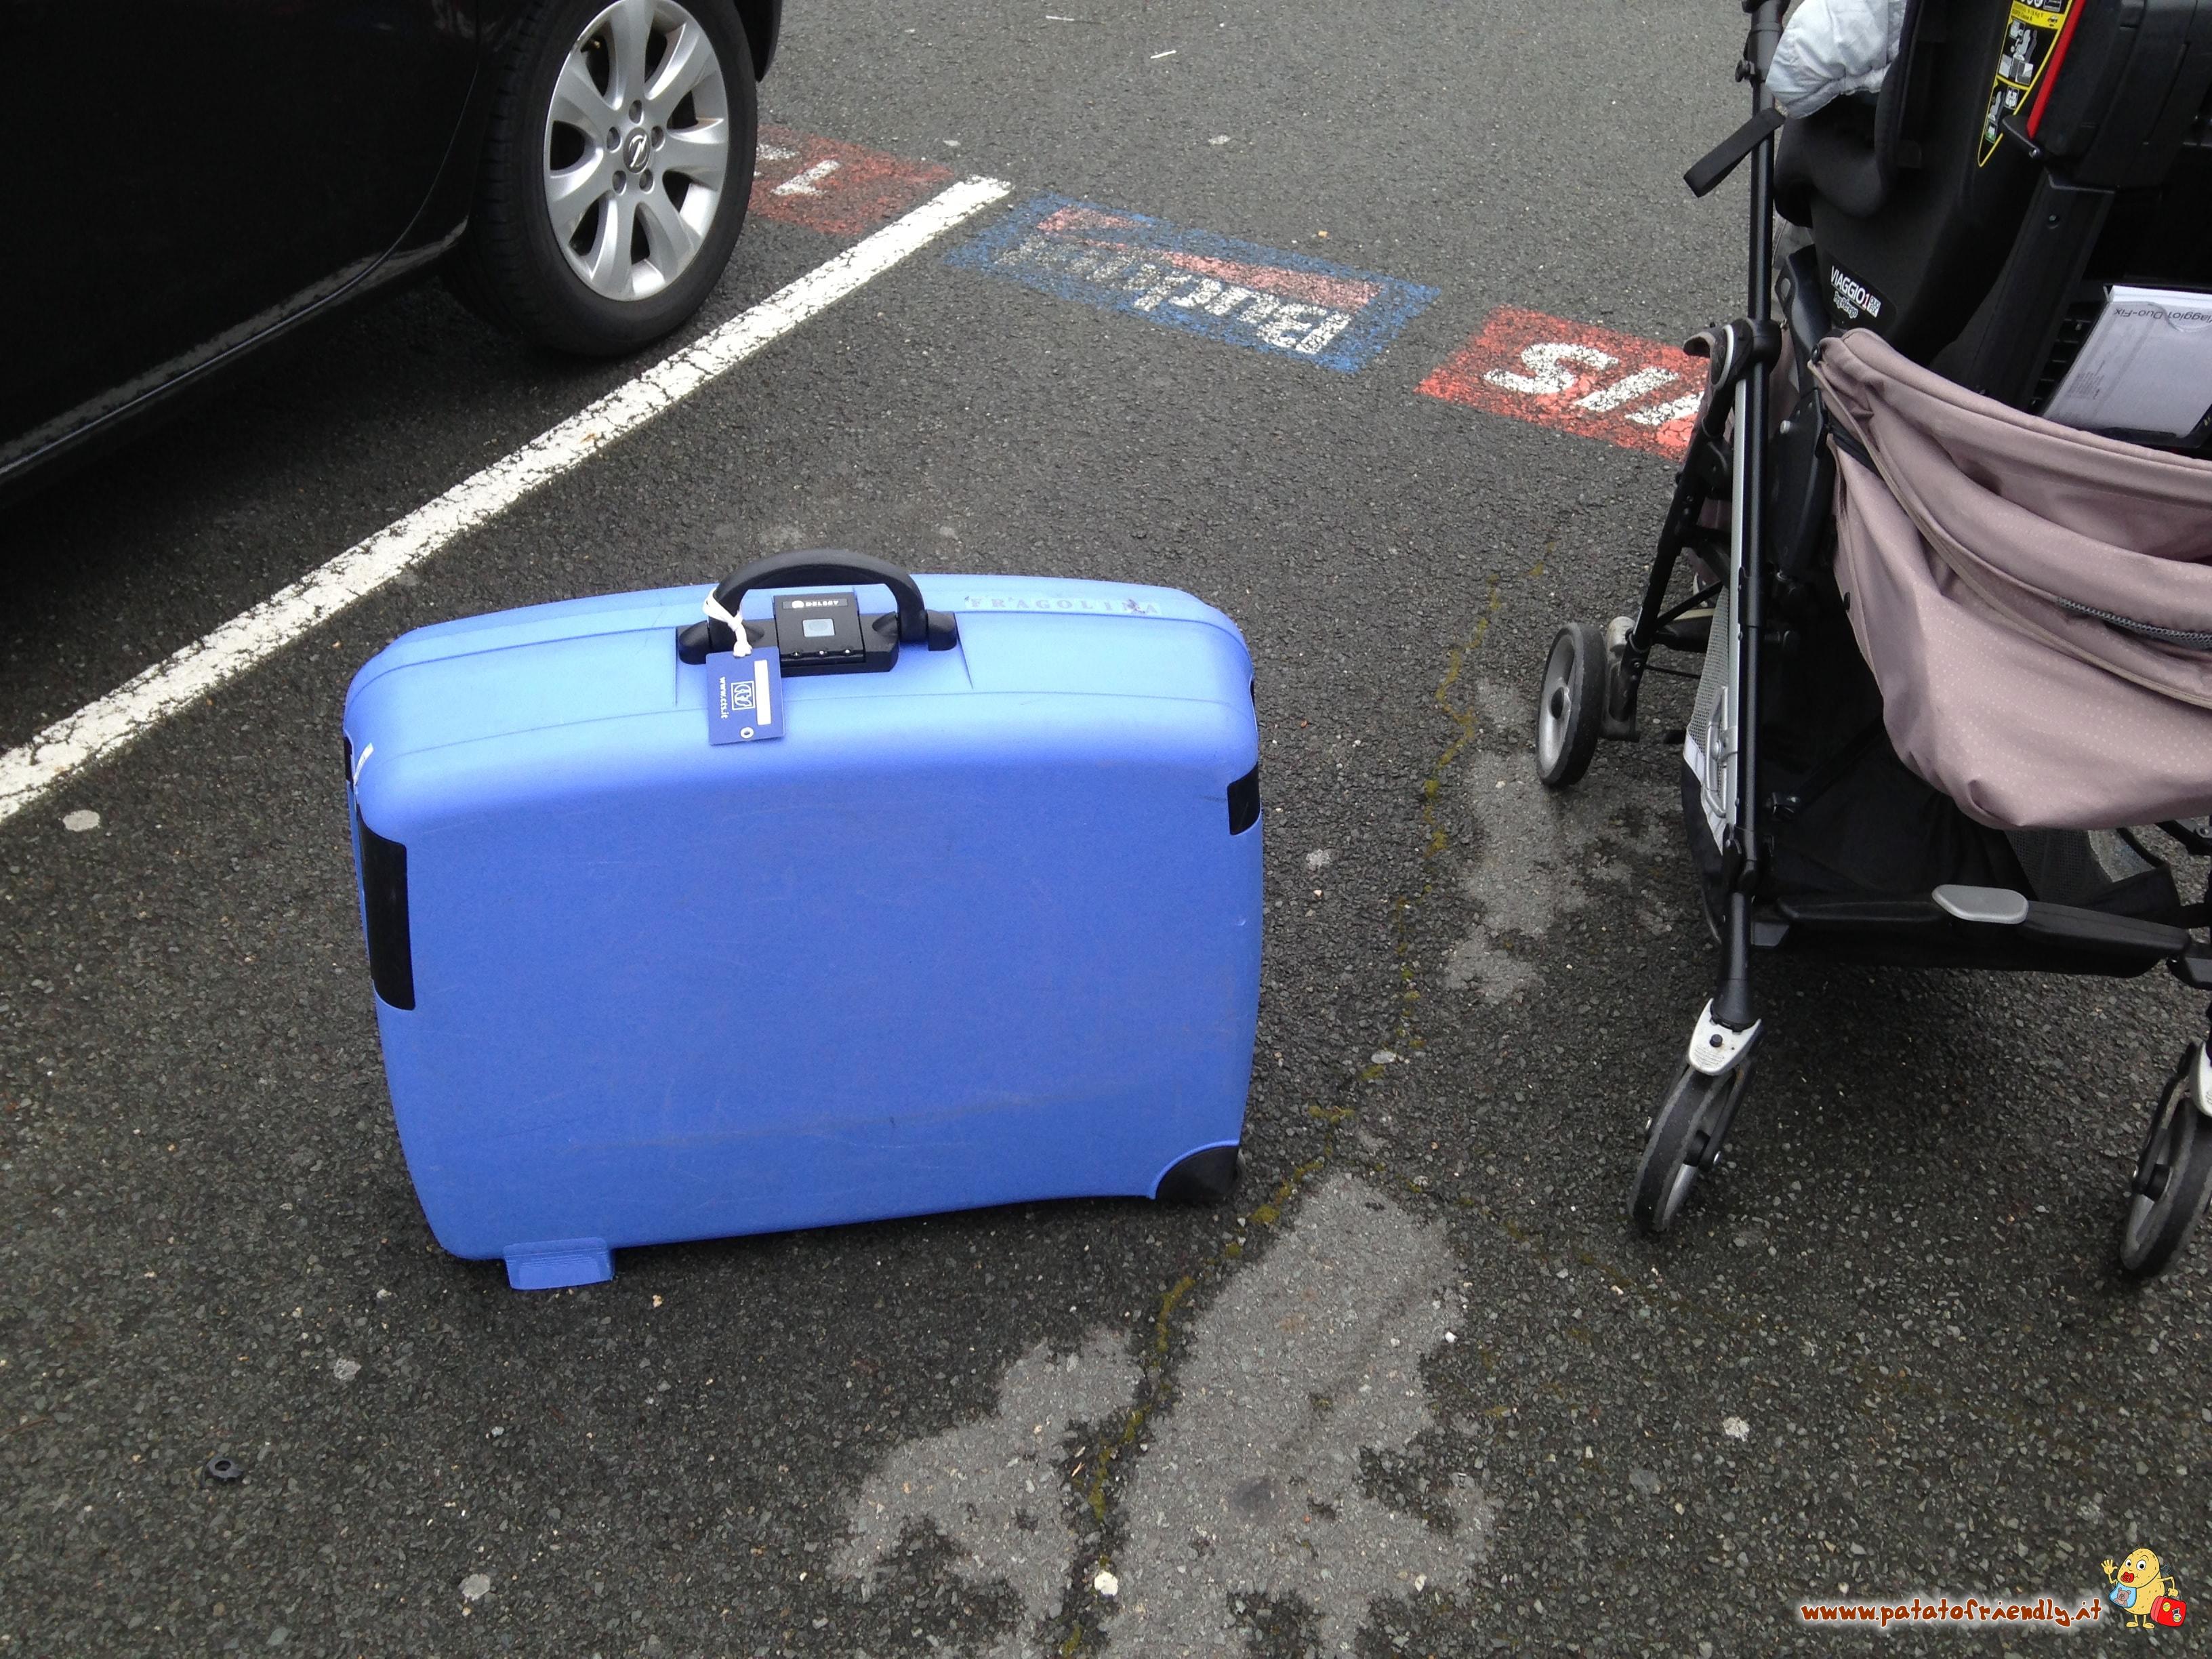 Viaggi on the road - Credits www.patatofriendly.it